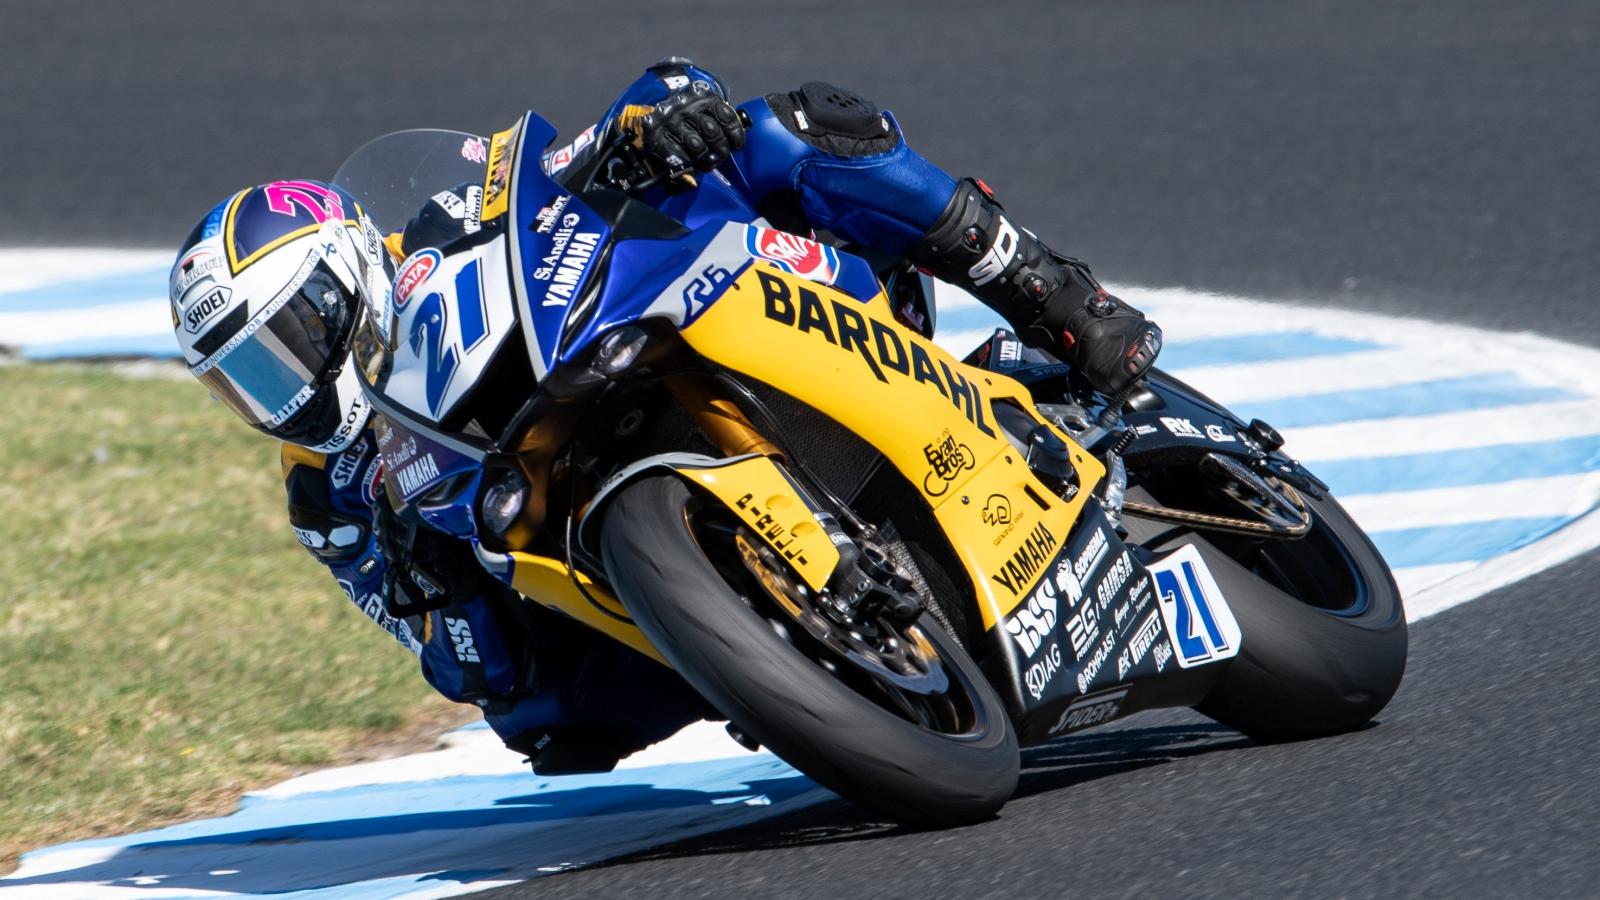 Randy Krummenacher vence en Supersport en Australia y Héctor Barberá roza el podio